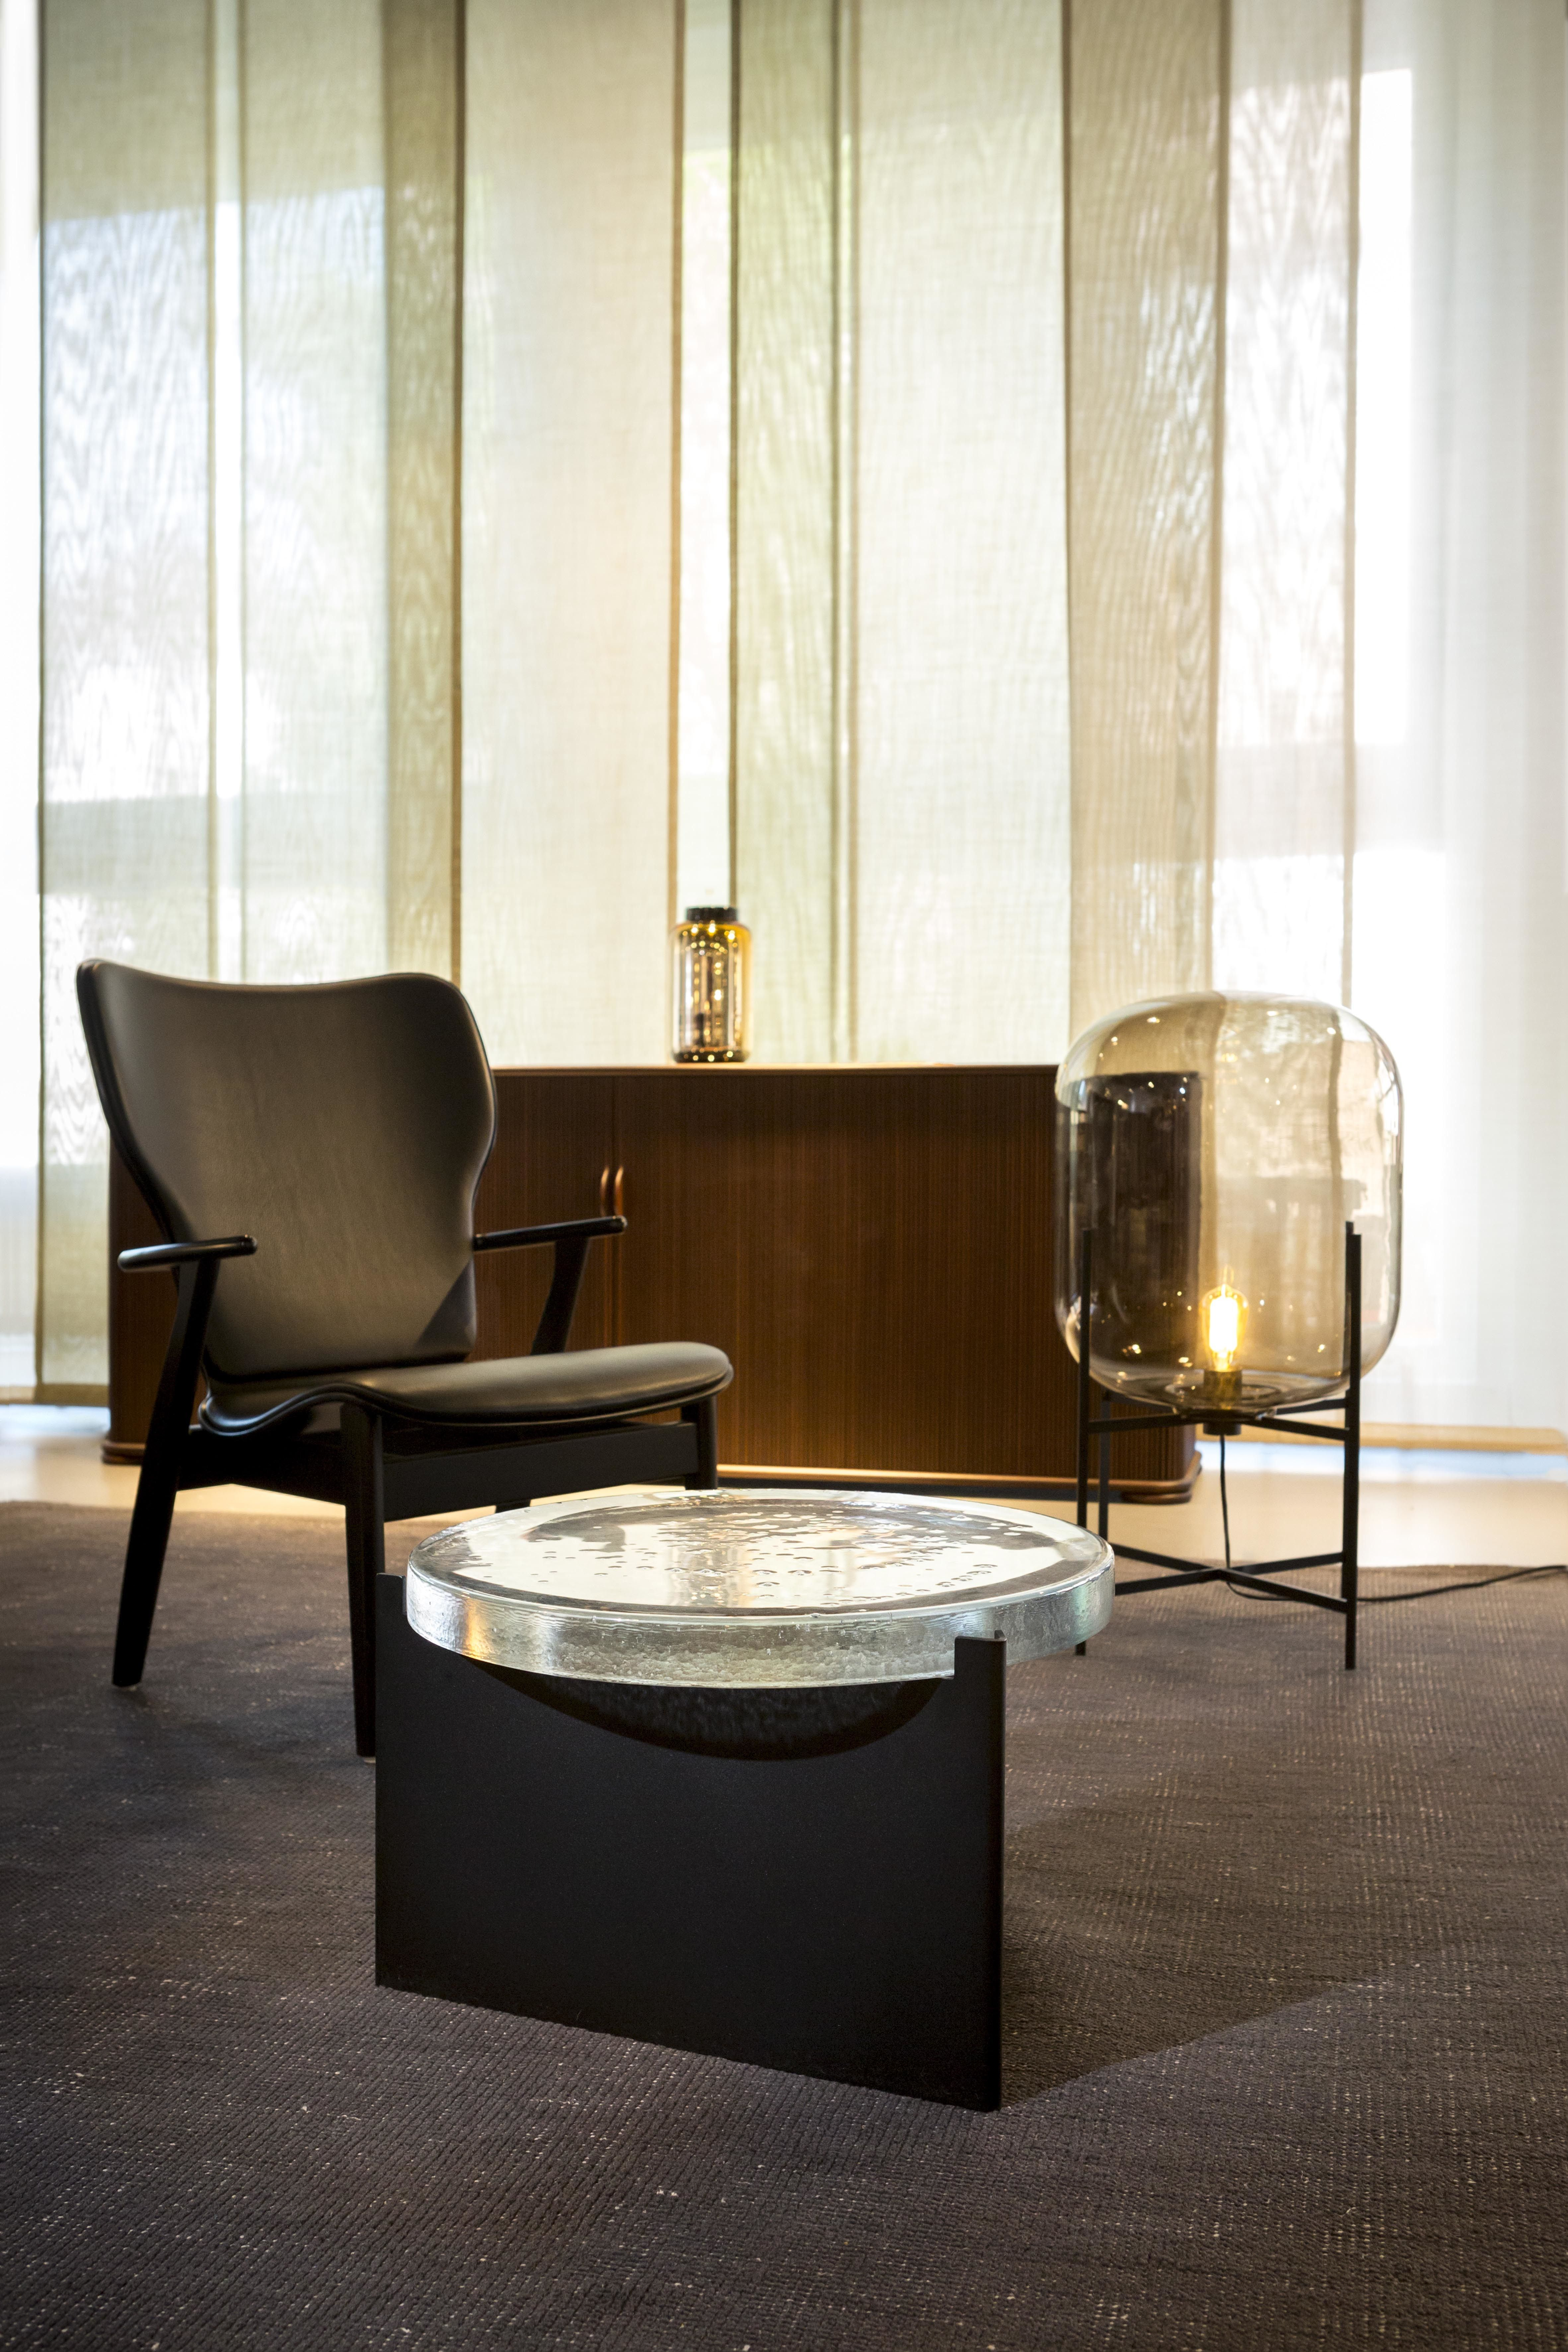 Coffee Table Alwa I Big By Sebastian Herkner For Pulpo Materials Colors Transparent Cast Glass Black Powder Coated St Vloerlamp Koffietafel Interieur